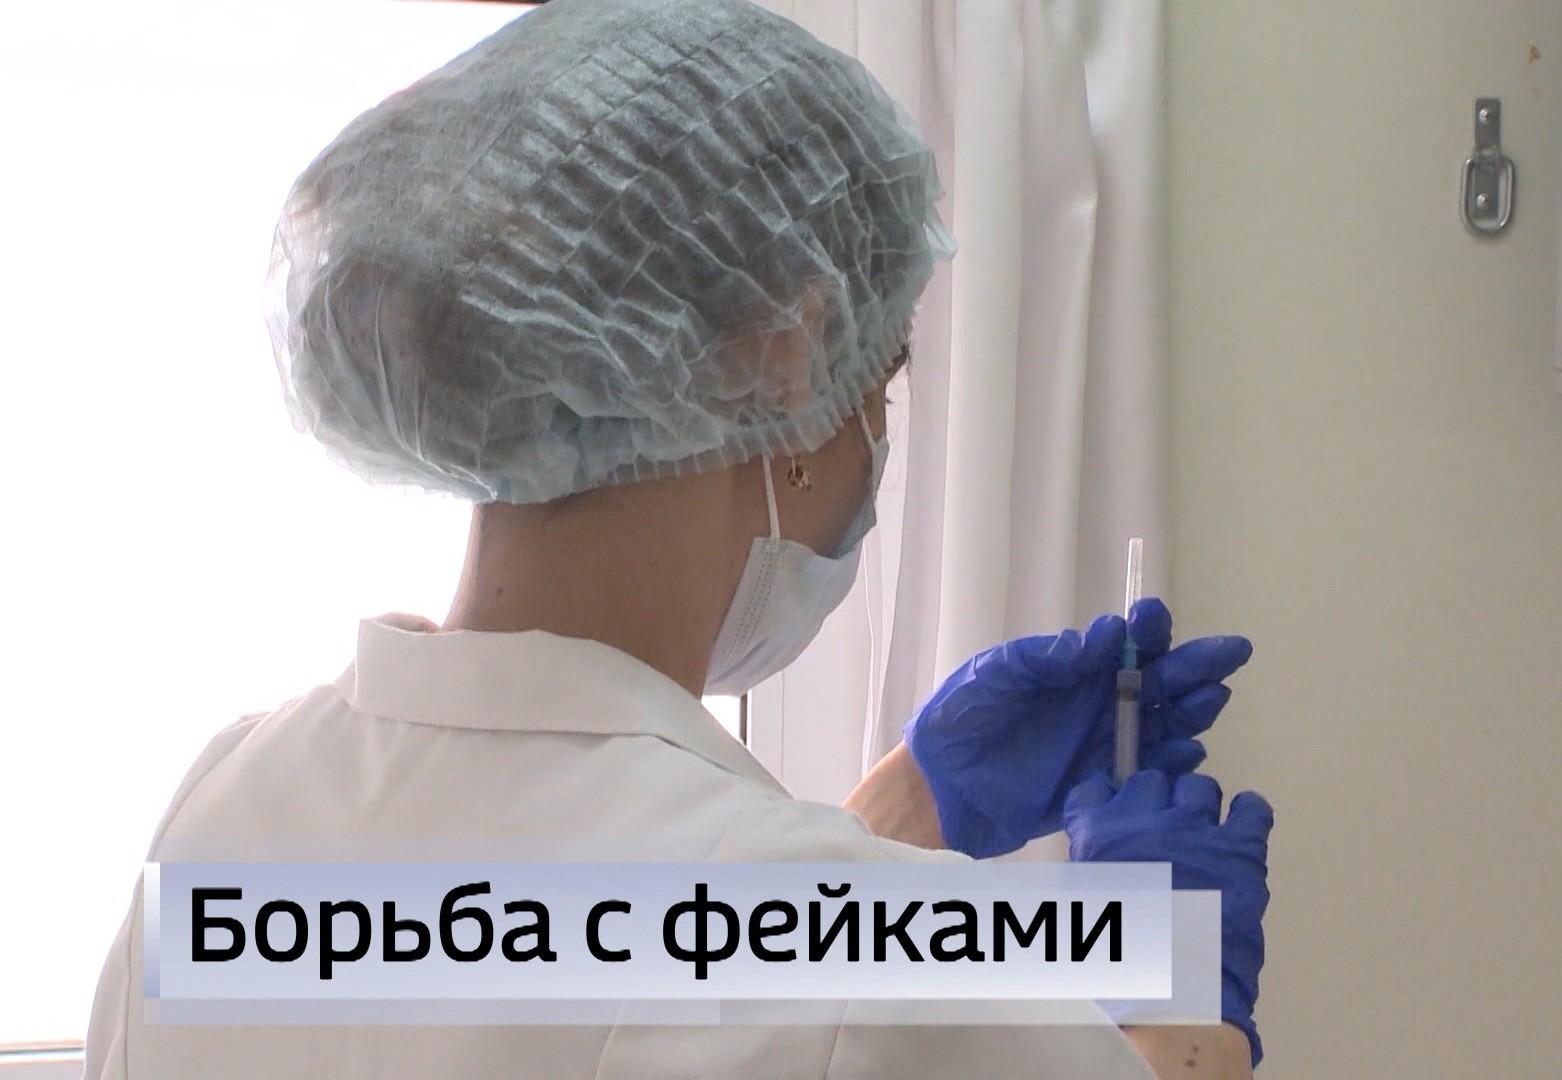 Интернет-пространство заполонили фейки на тему вакцинации